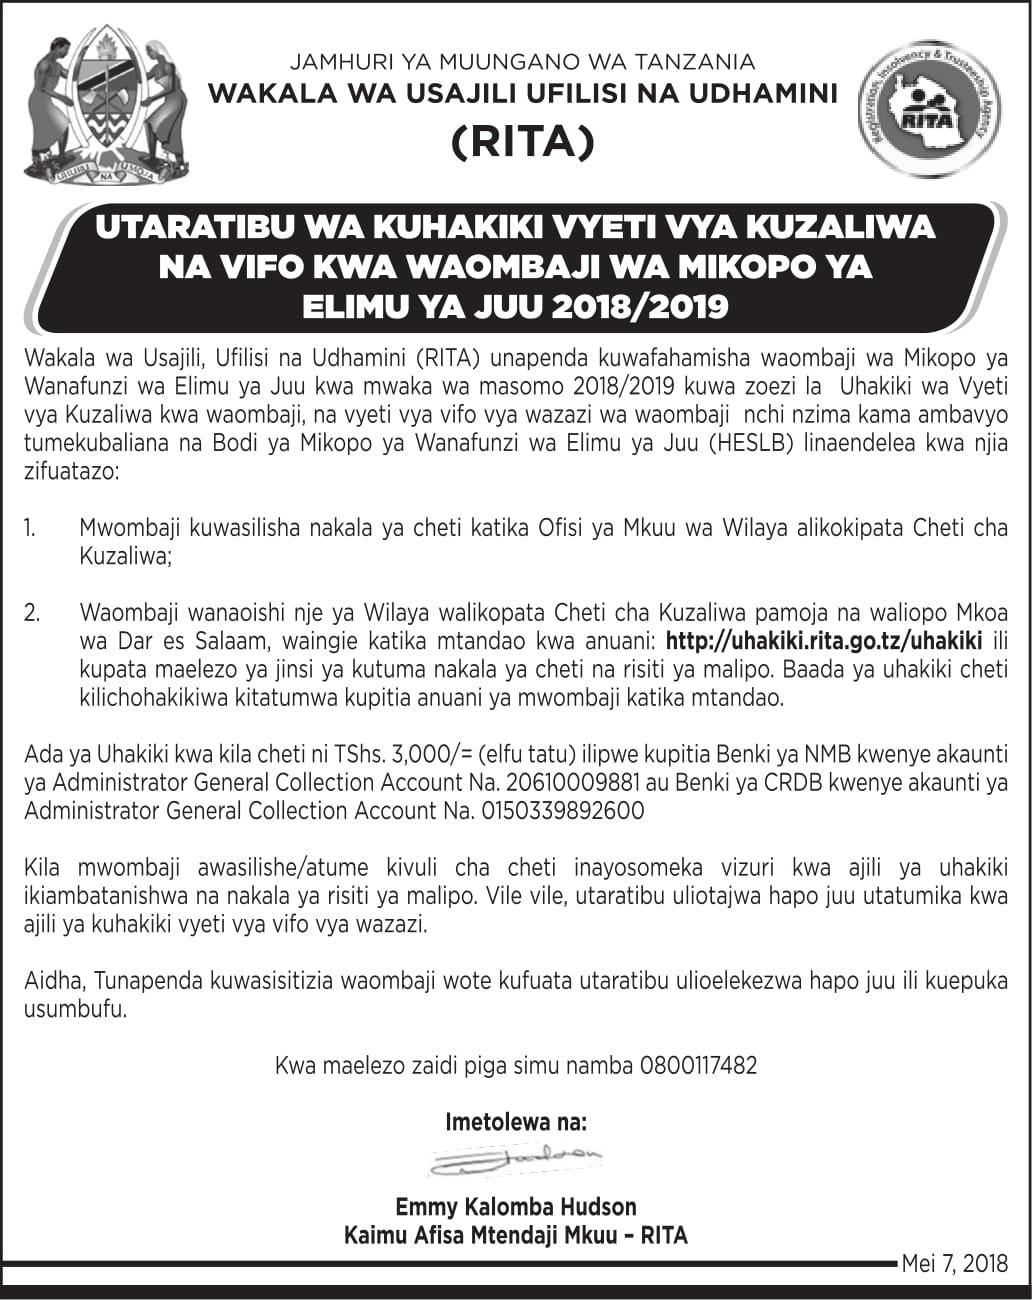 Rita Public Notice About Birthdeath Certificates Verification For